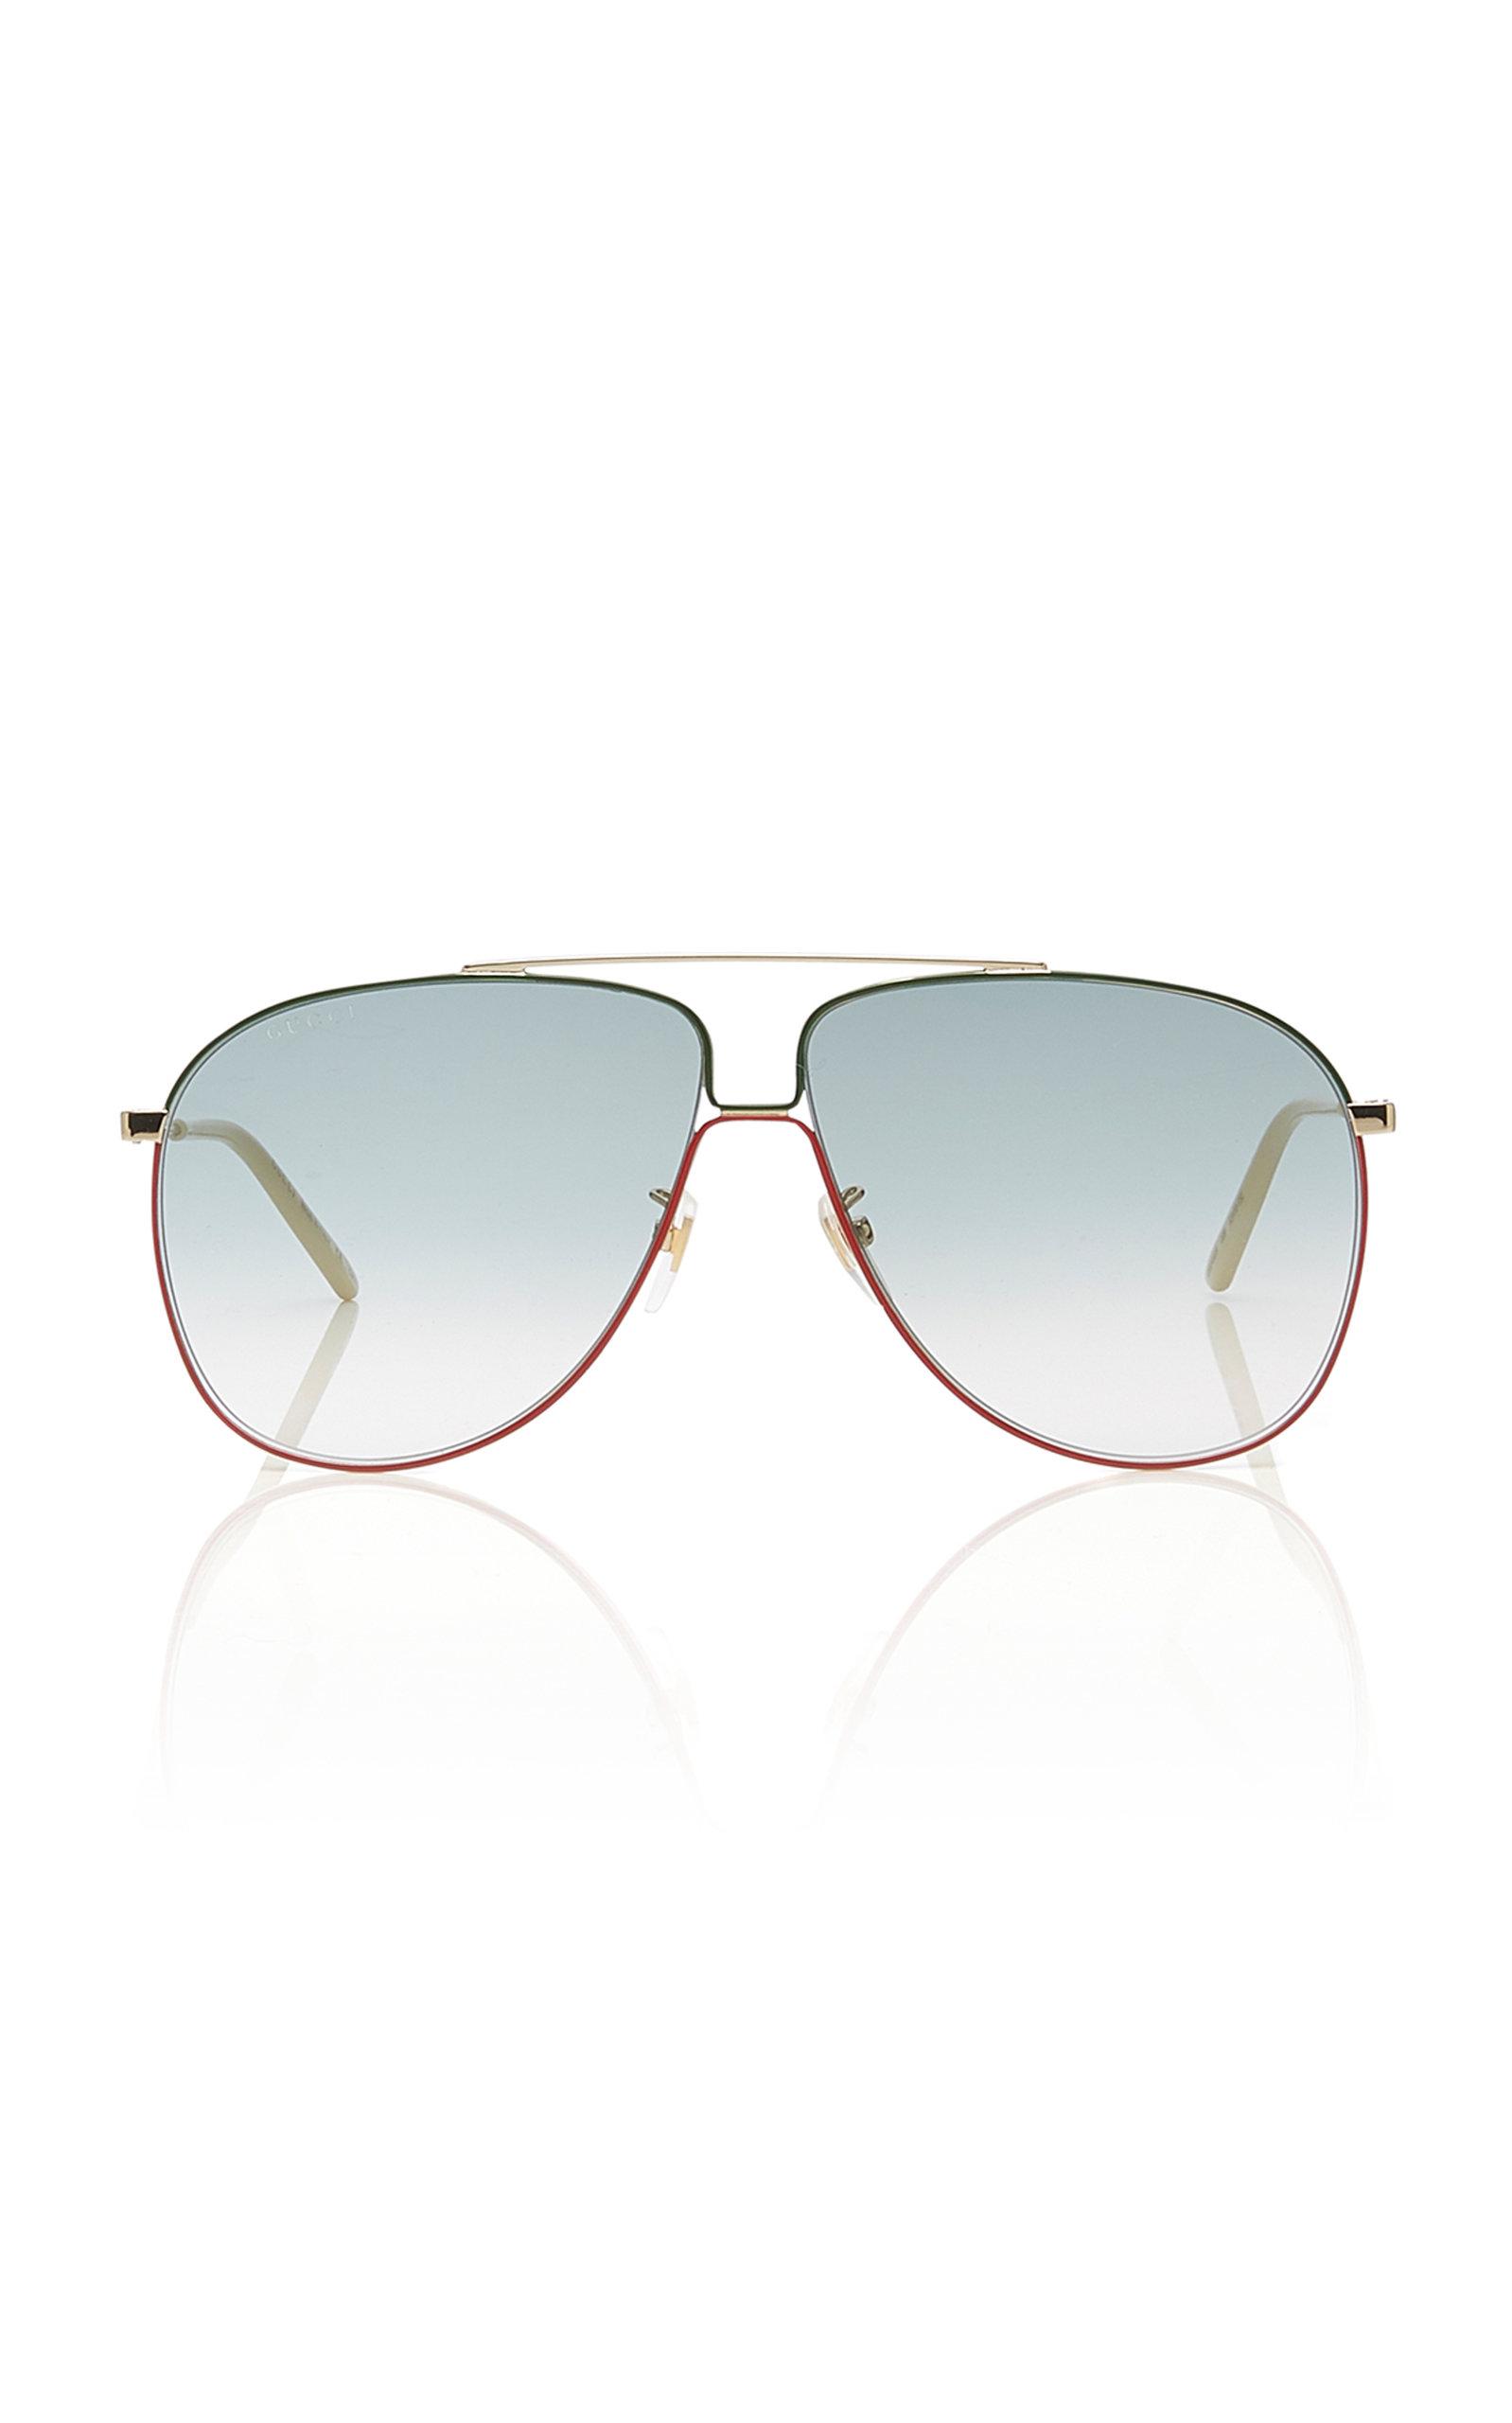 6bd392c62 Aviator-Style Metal Sunglasses by Gucci | Moda Operandi